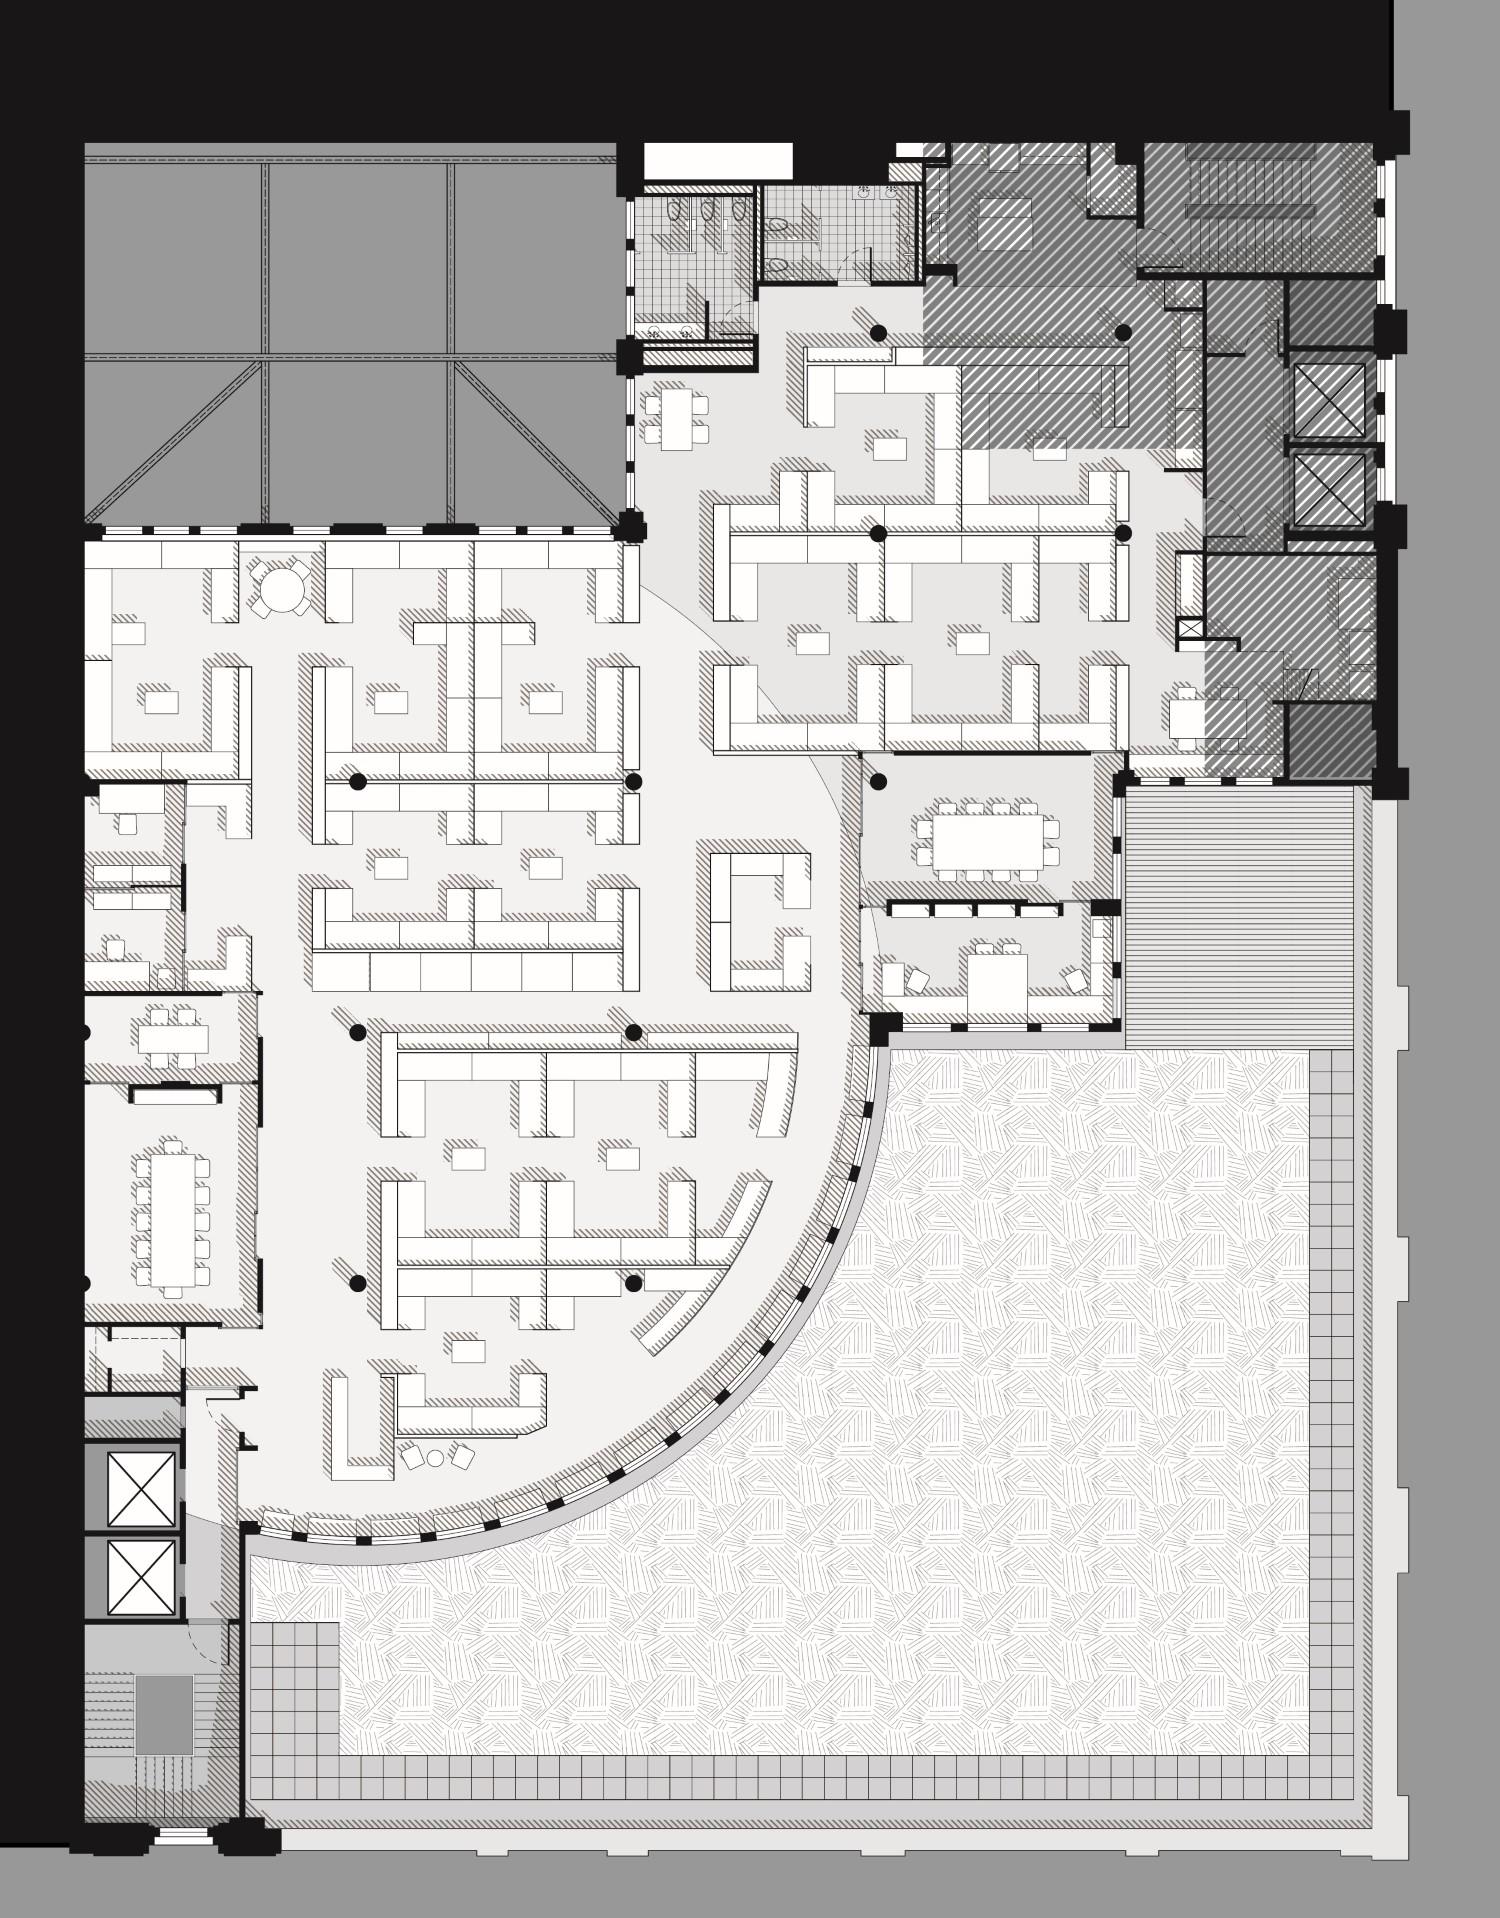 641_Plan.jpg